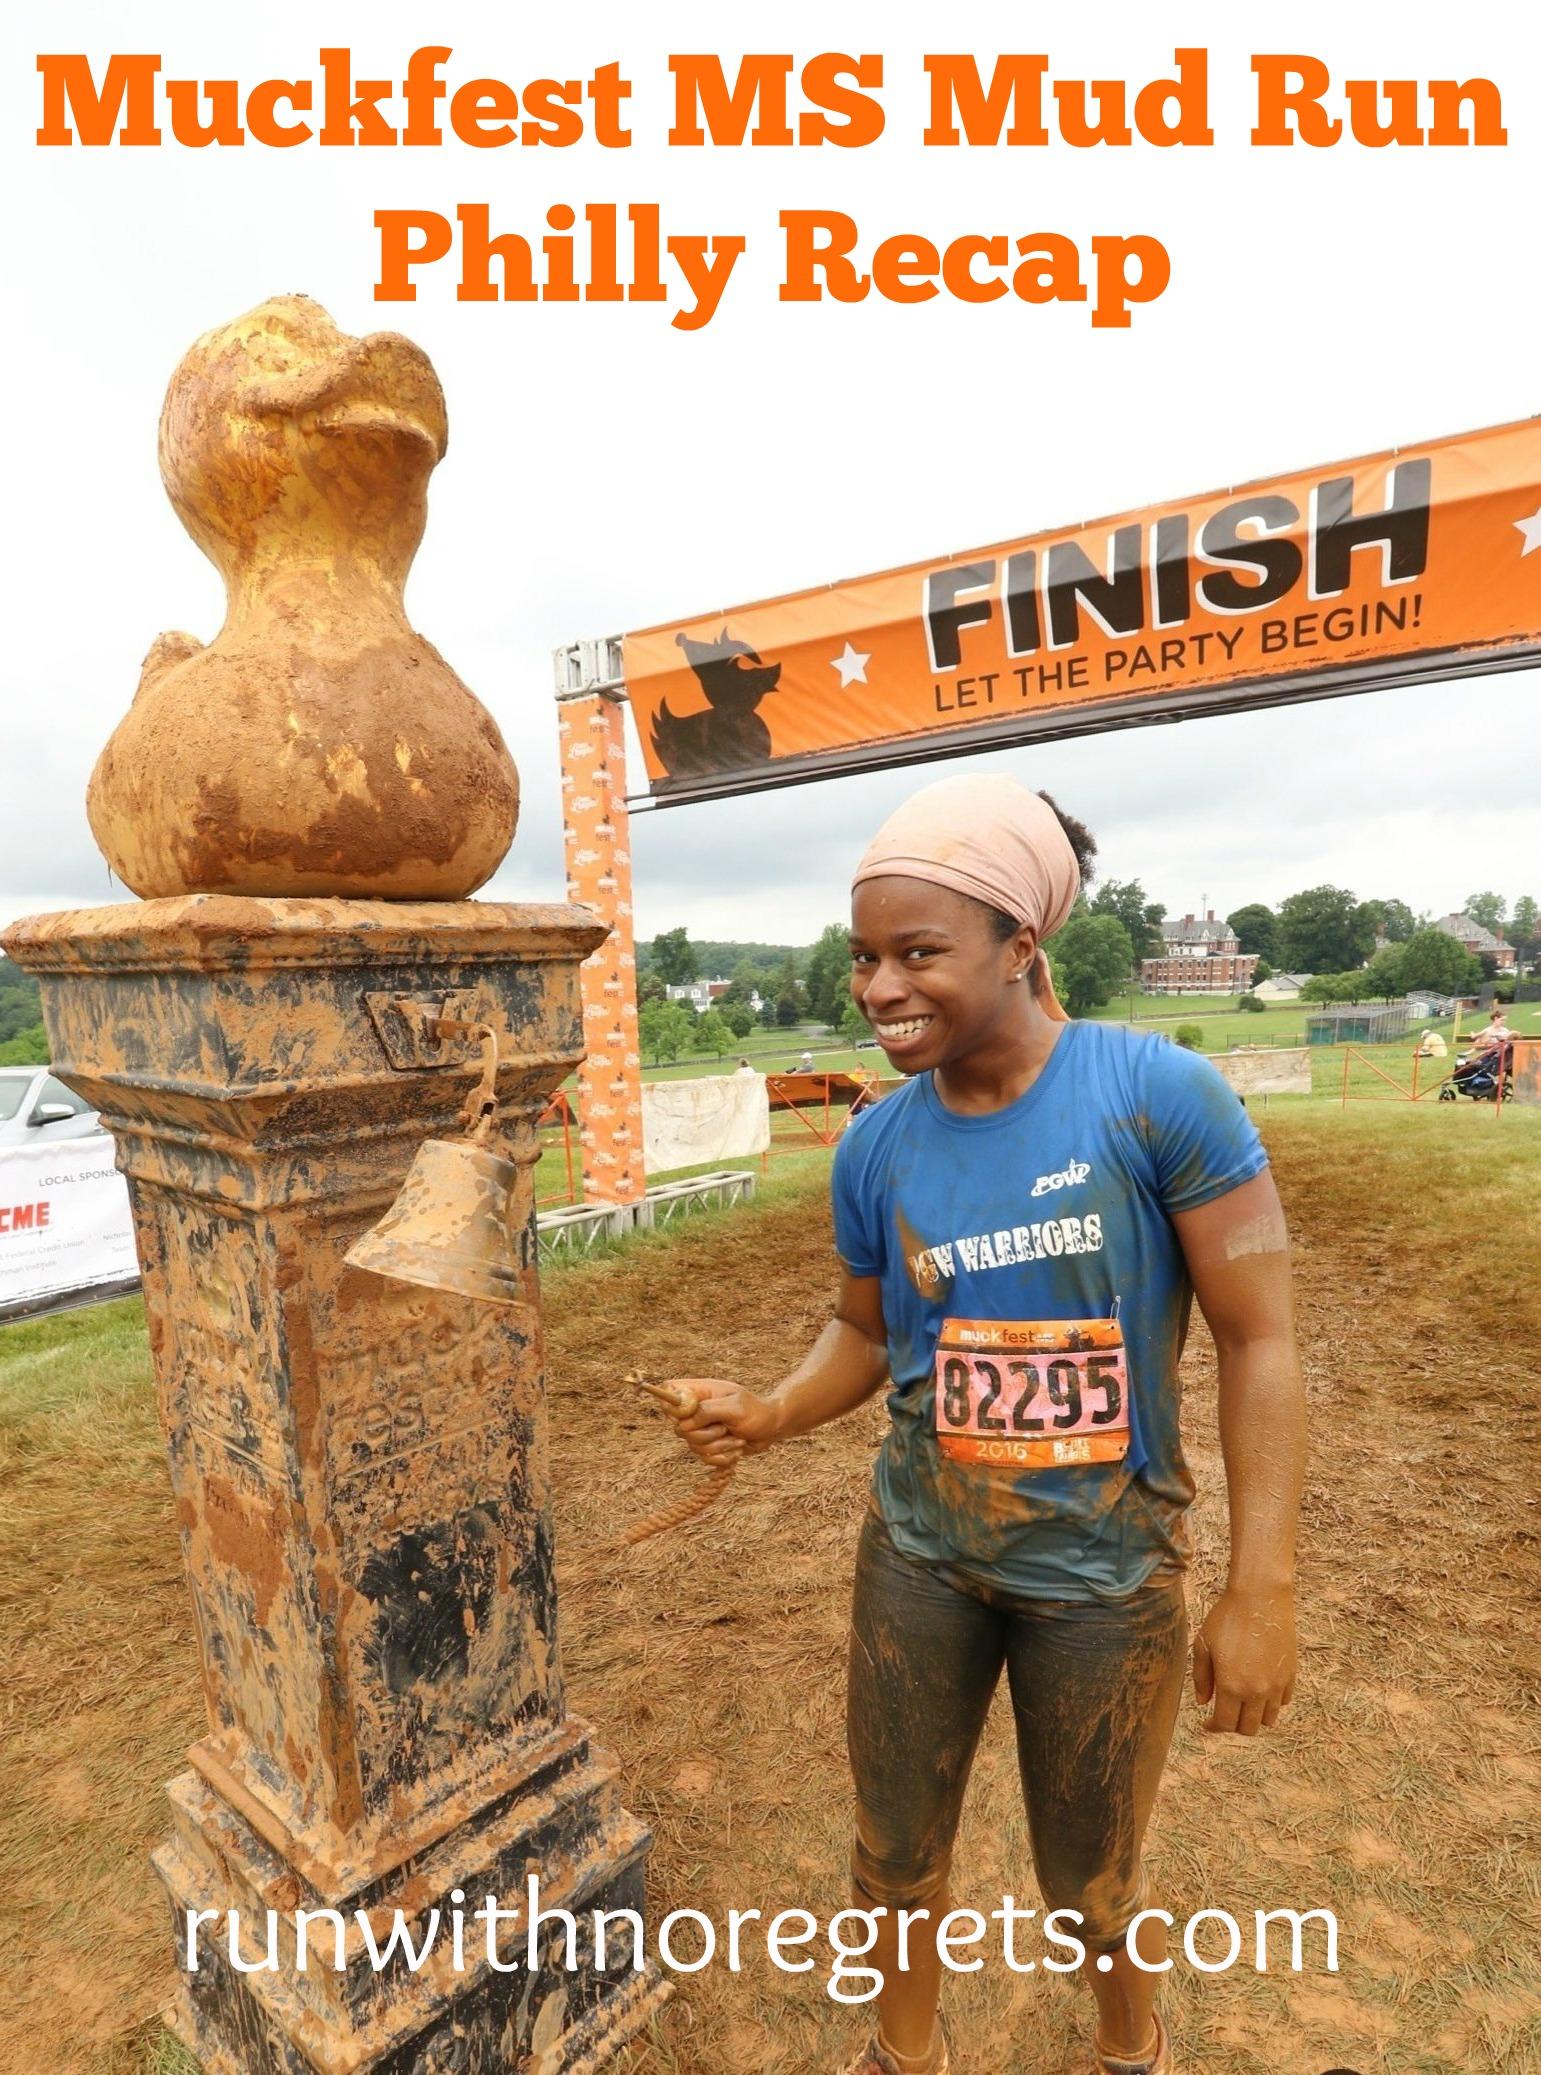 Fun And Easy Psychic Games: Muckfest MS Mud Run Philly Recap